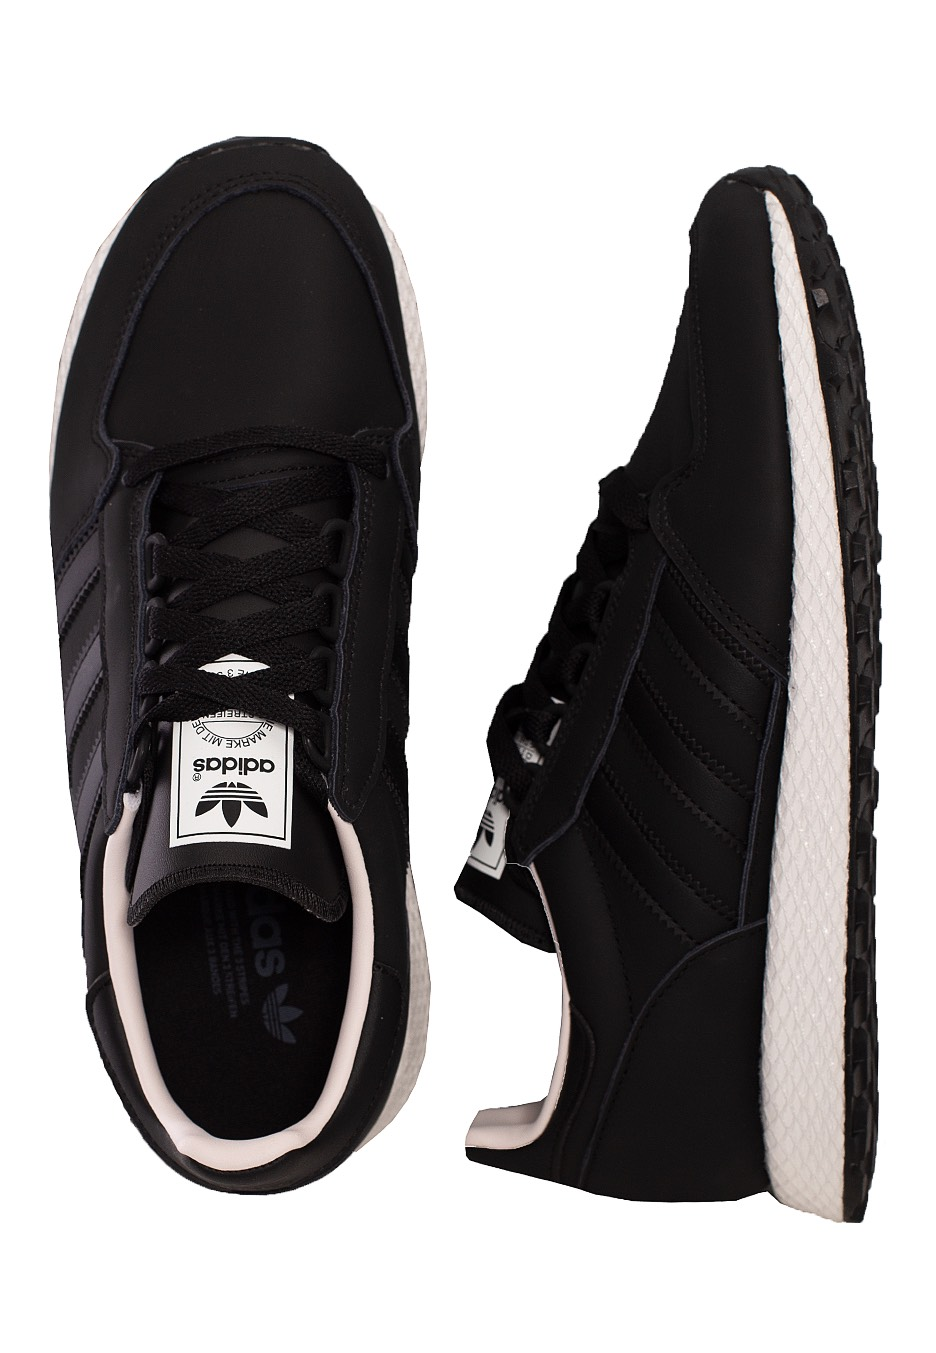 Adidas Forest Grove Core BlackCore BlackOrchid Tint S18 Shoes